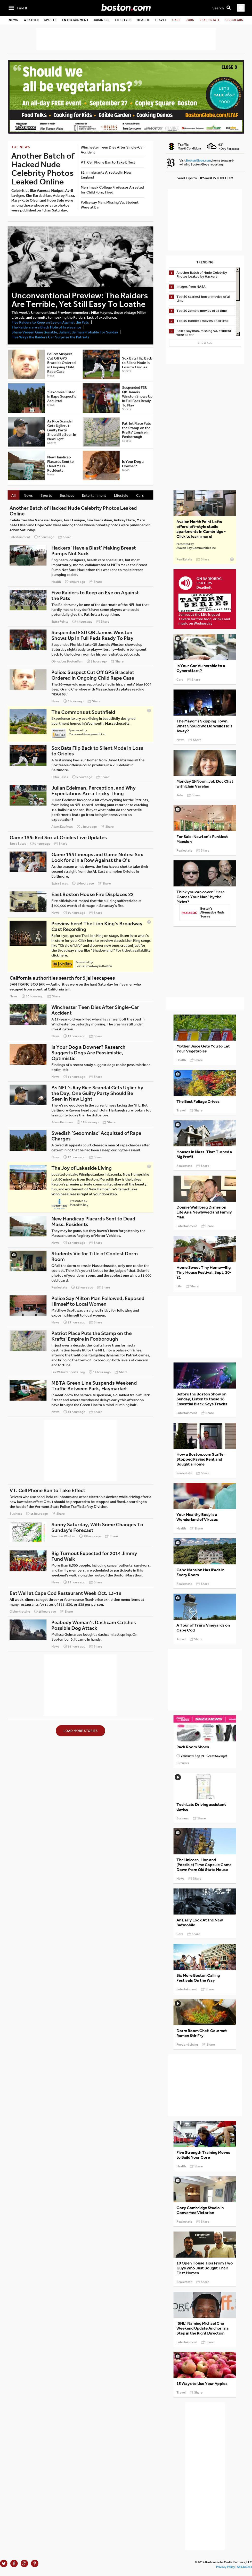 Boston.com at Sunday Sept. 21, 2014, 7:01 a.m. UTC